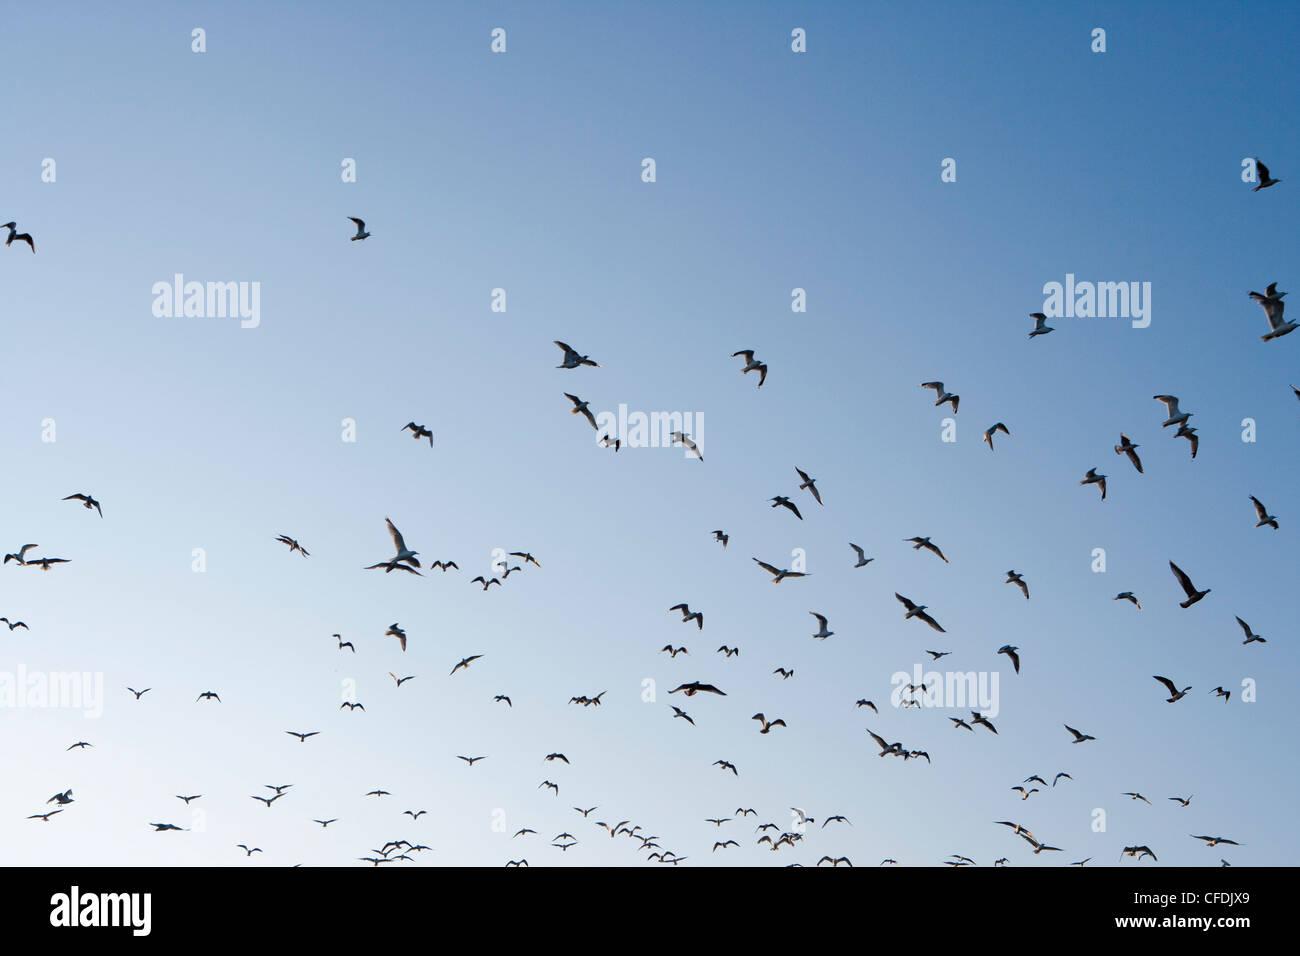 Flock of seagulls, Klaipeda, Klaipedos, Lithuania - Stock Image